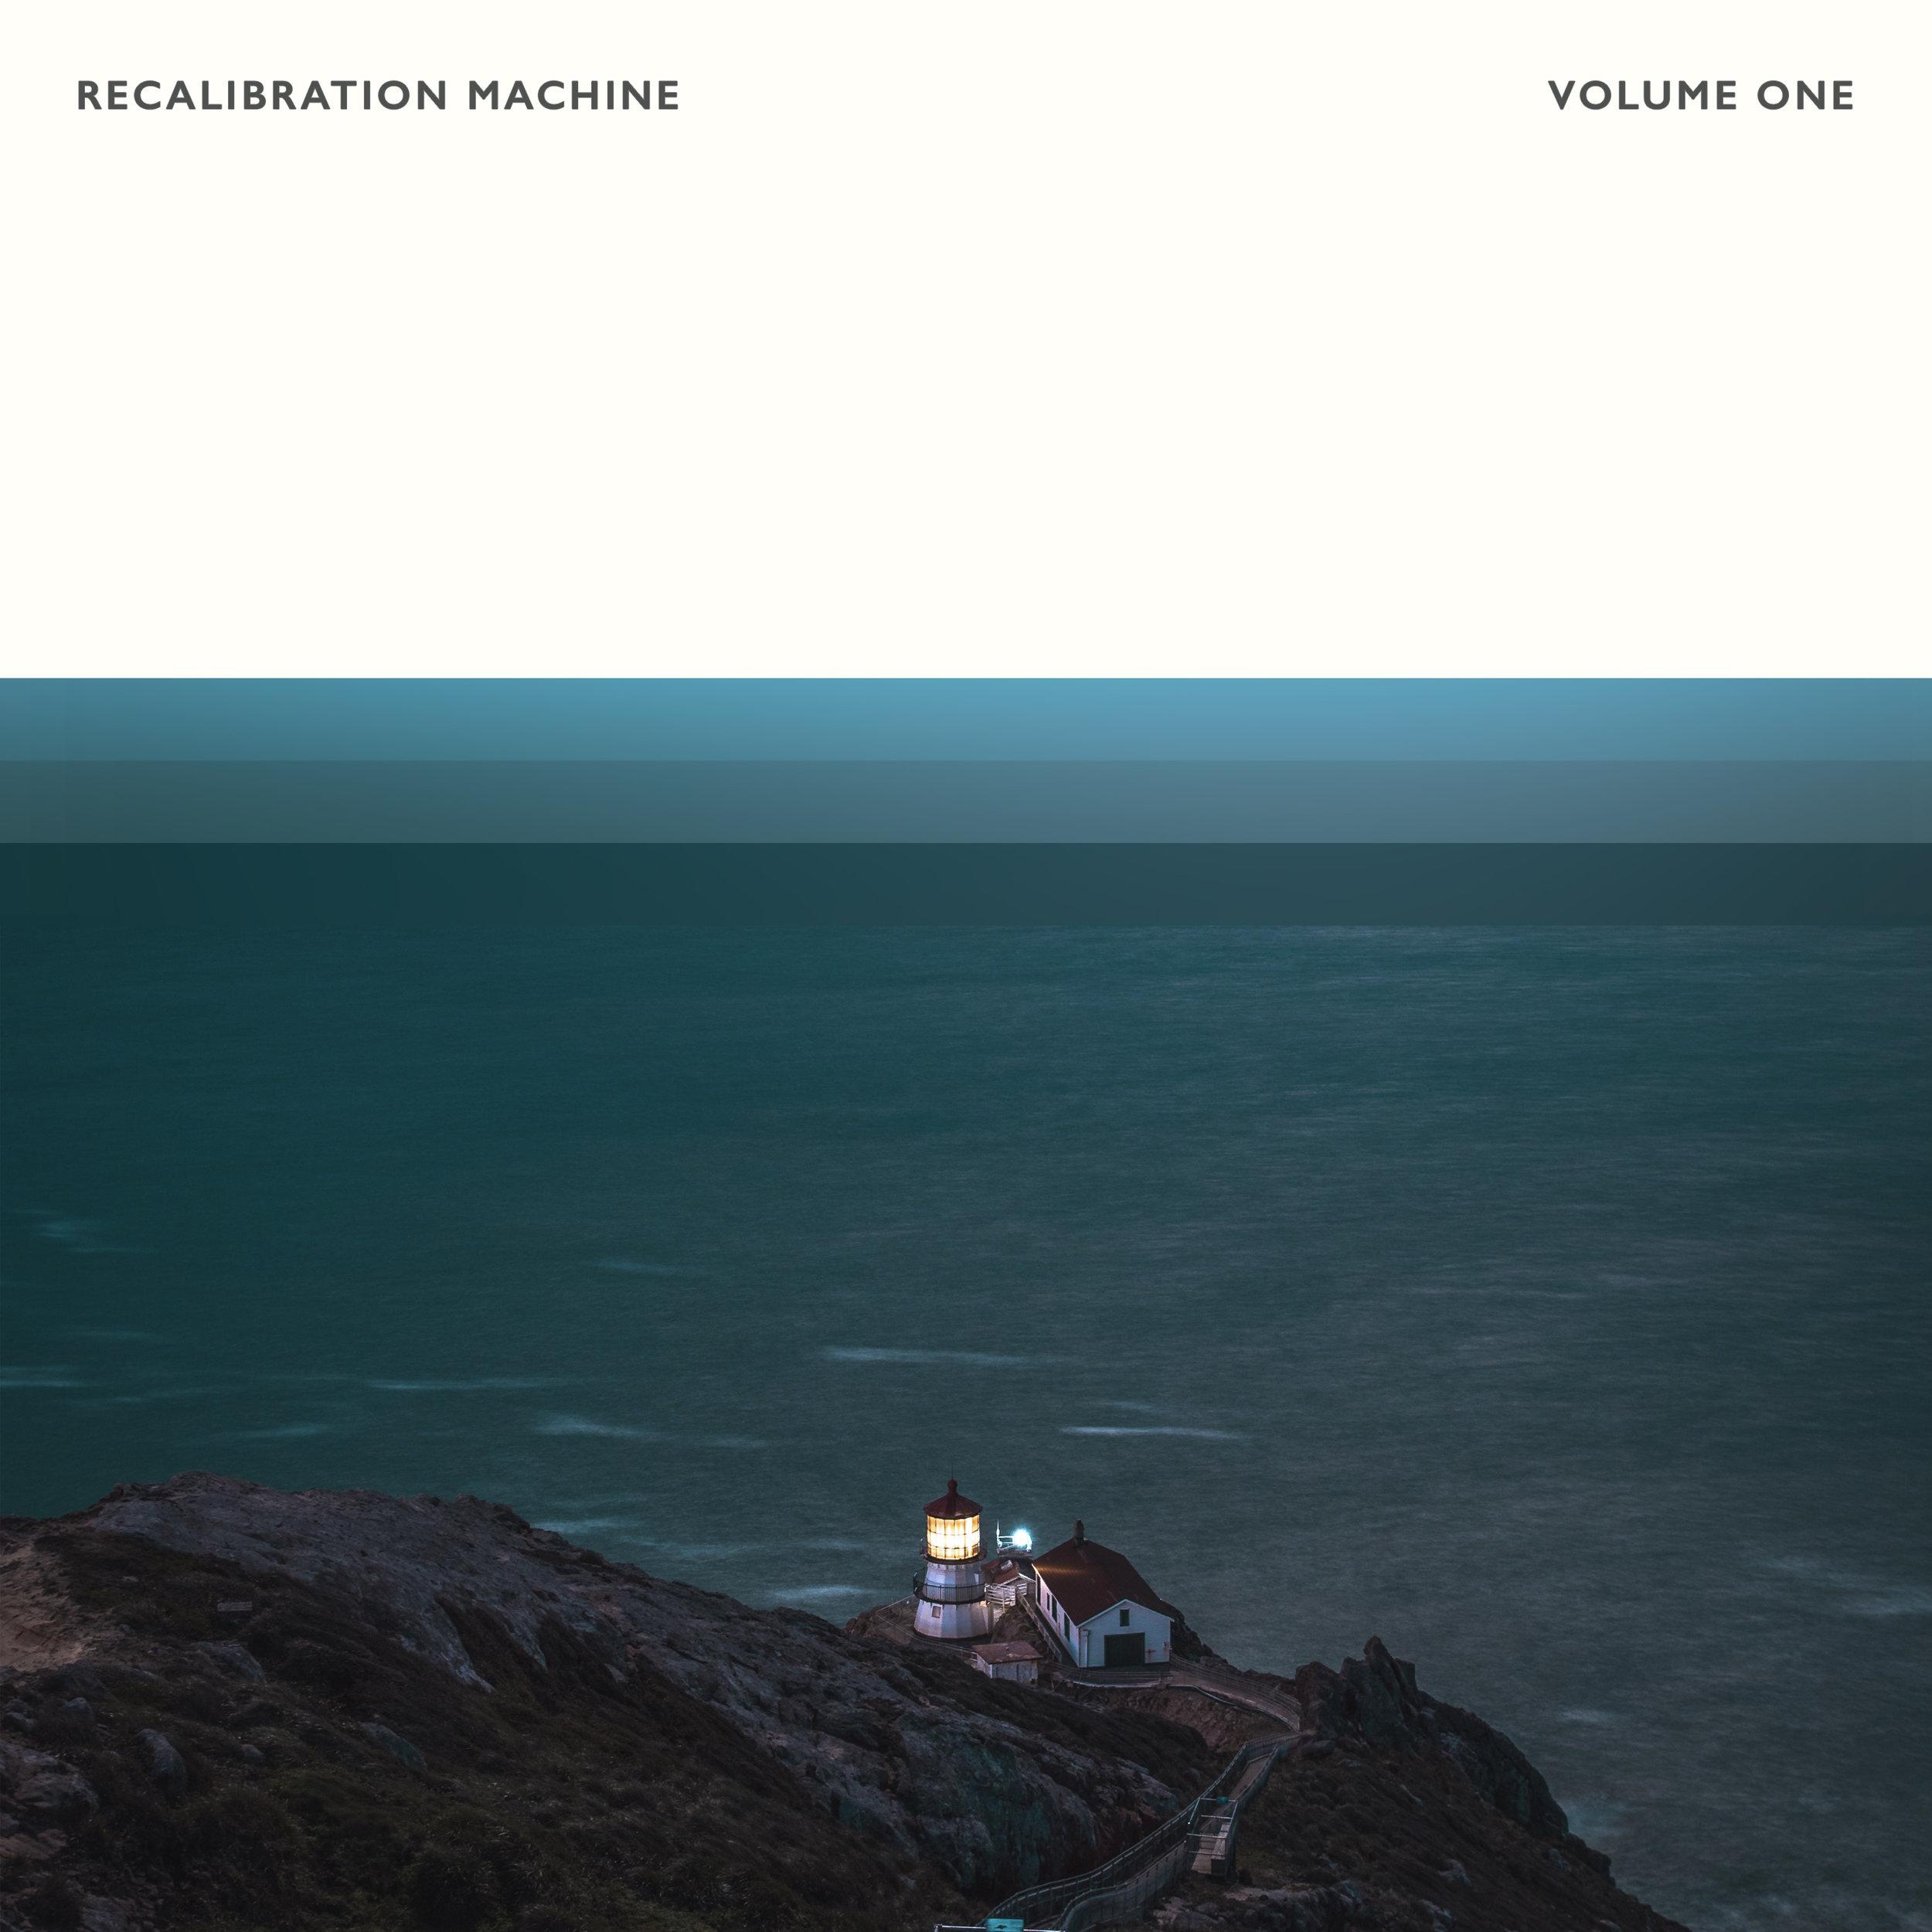 Recalibration Machine - Volume One